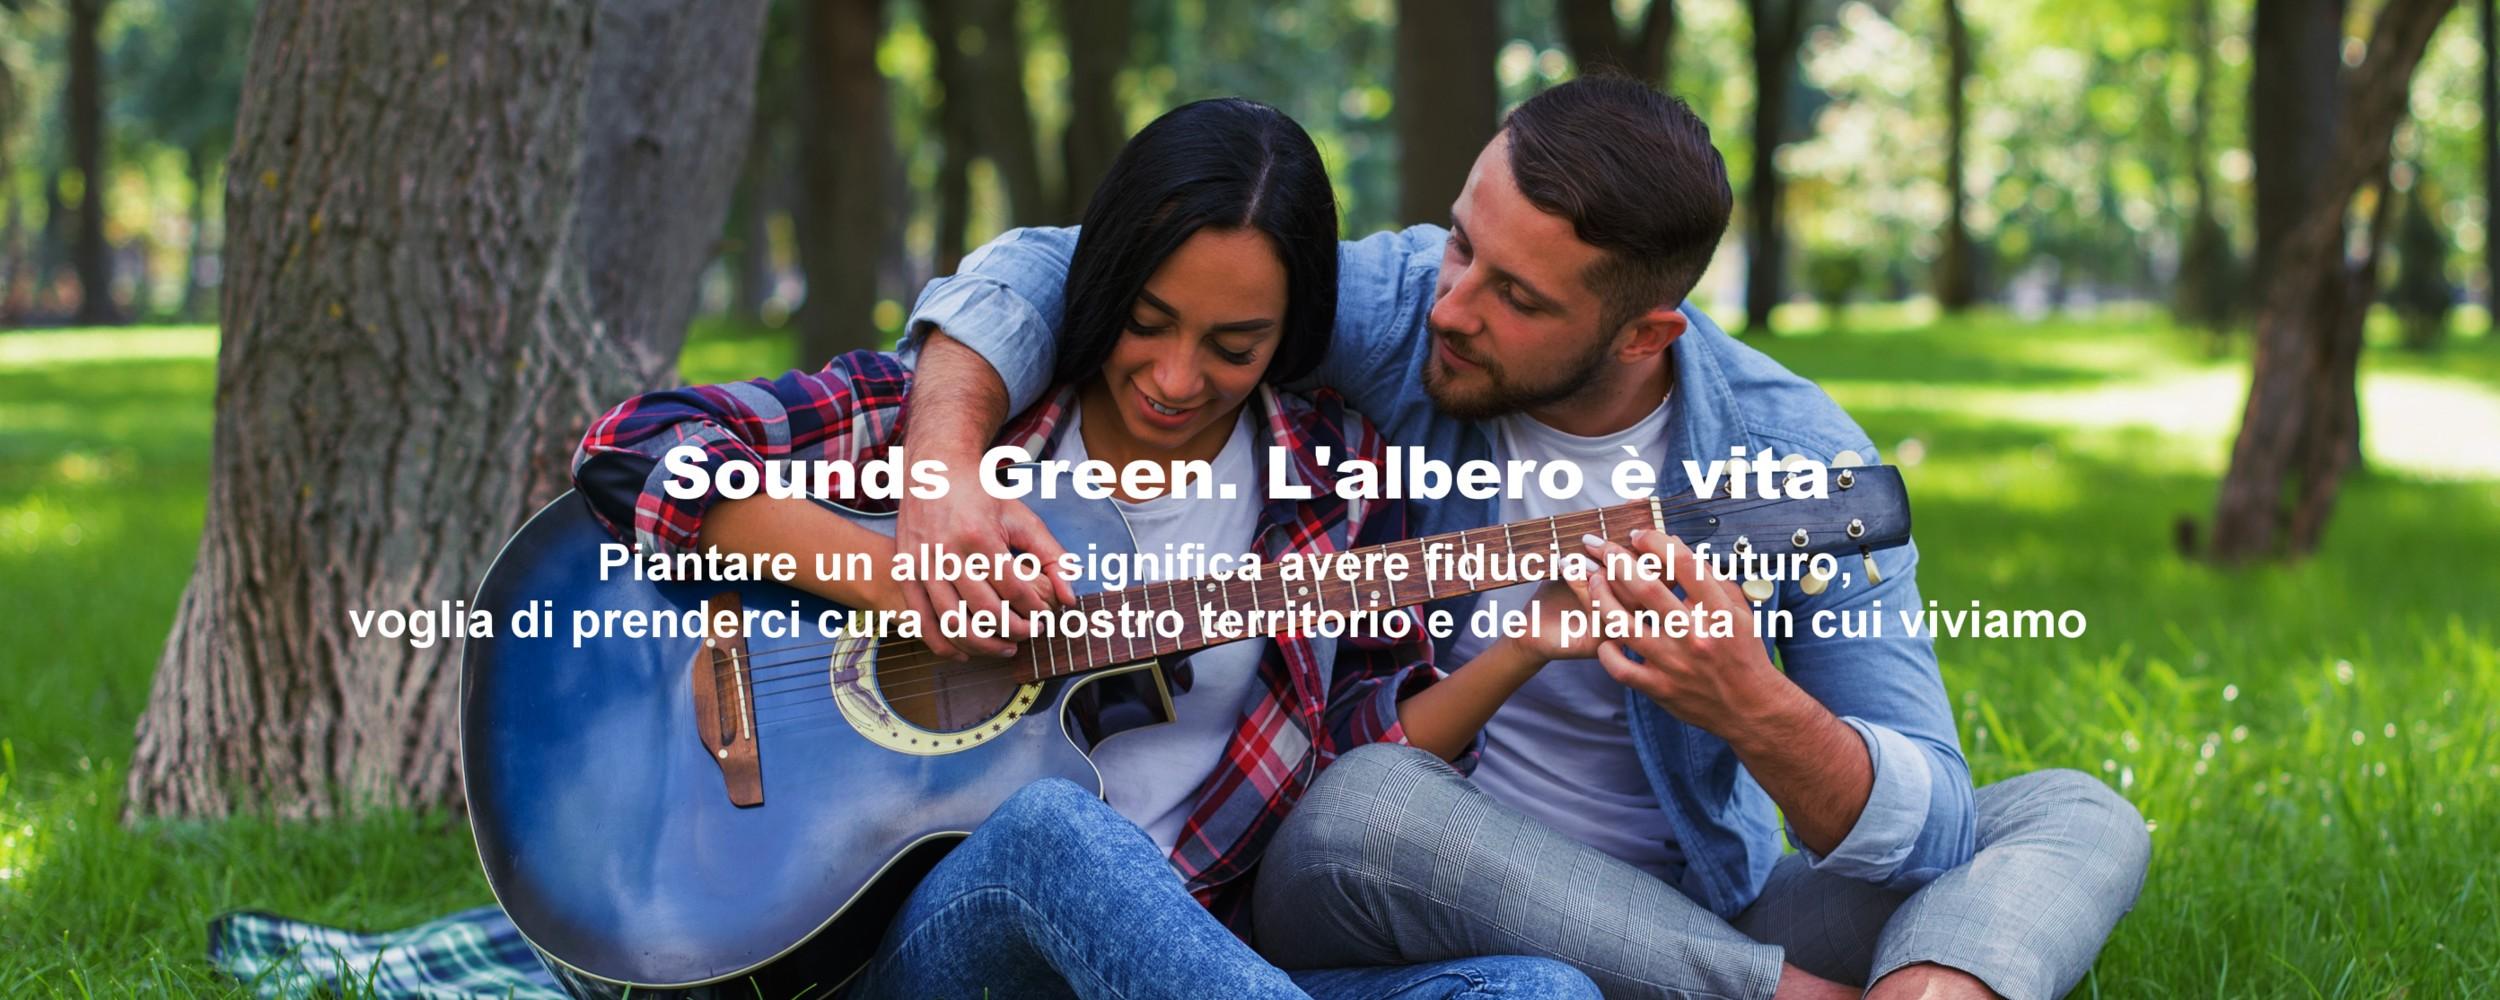 Sounds Green. L'albero è vita